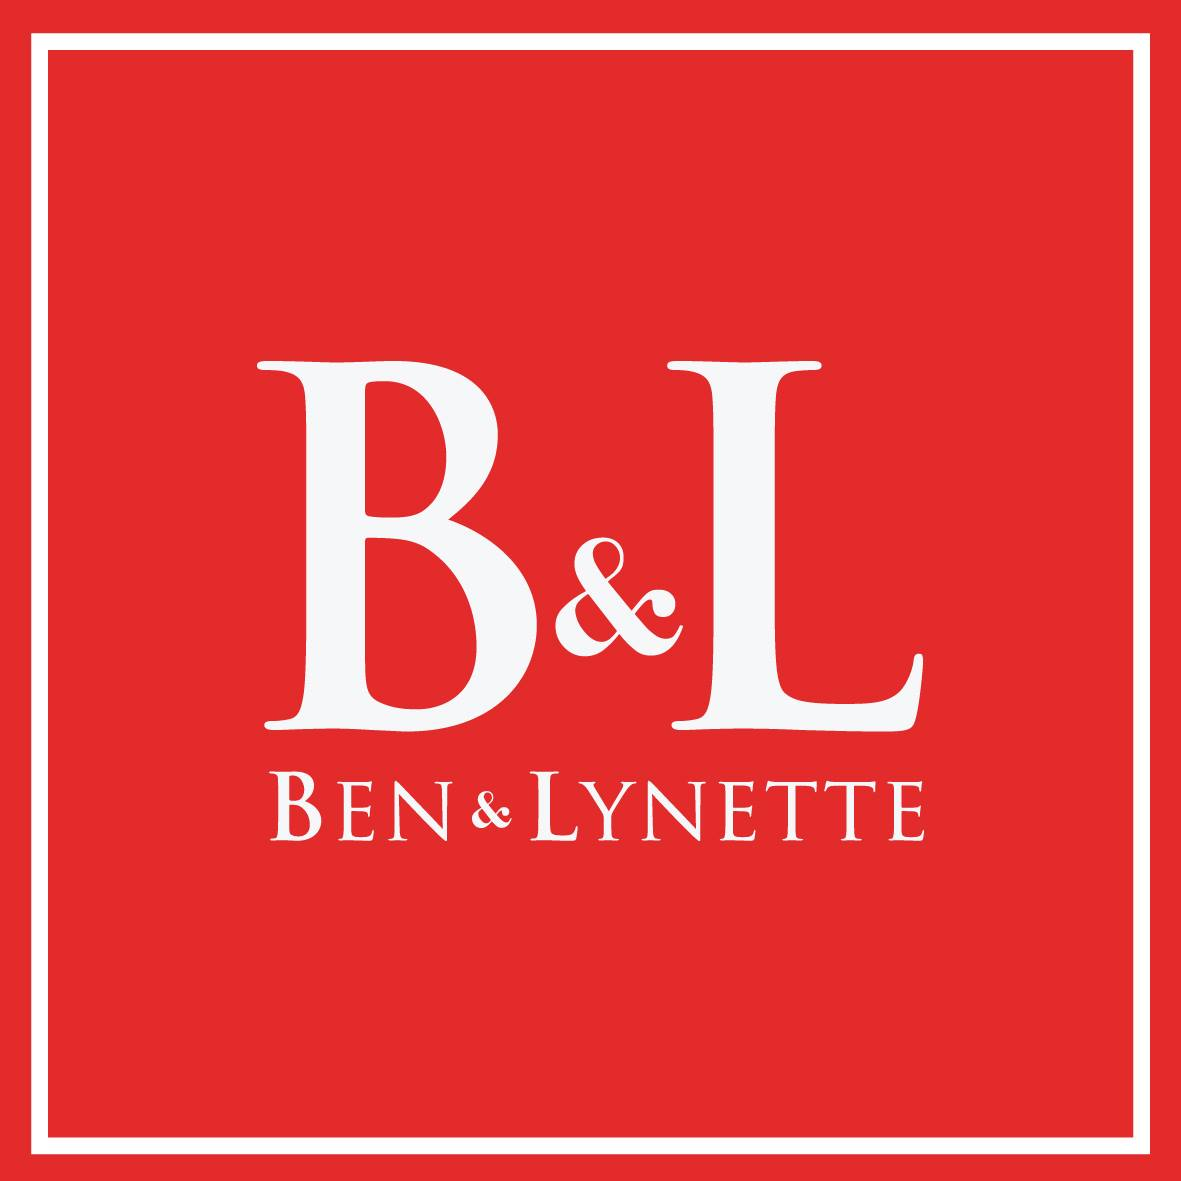 Ben & Lynette